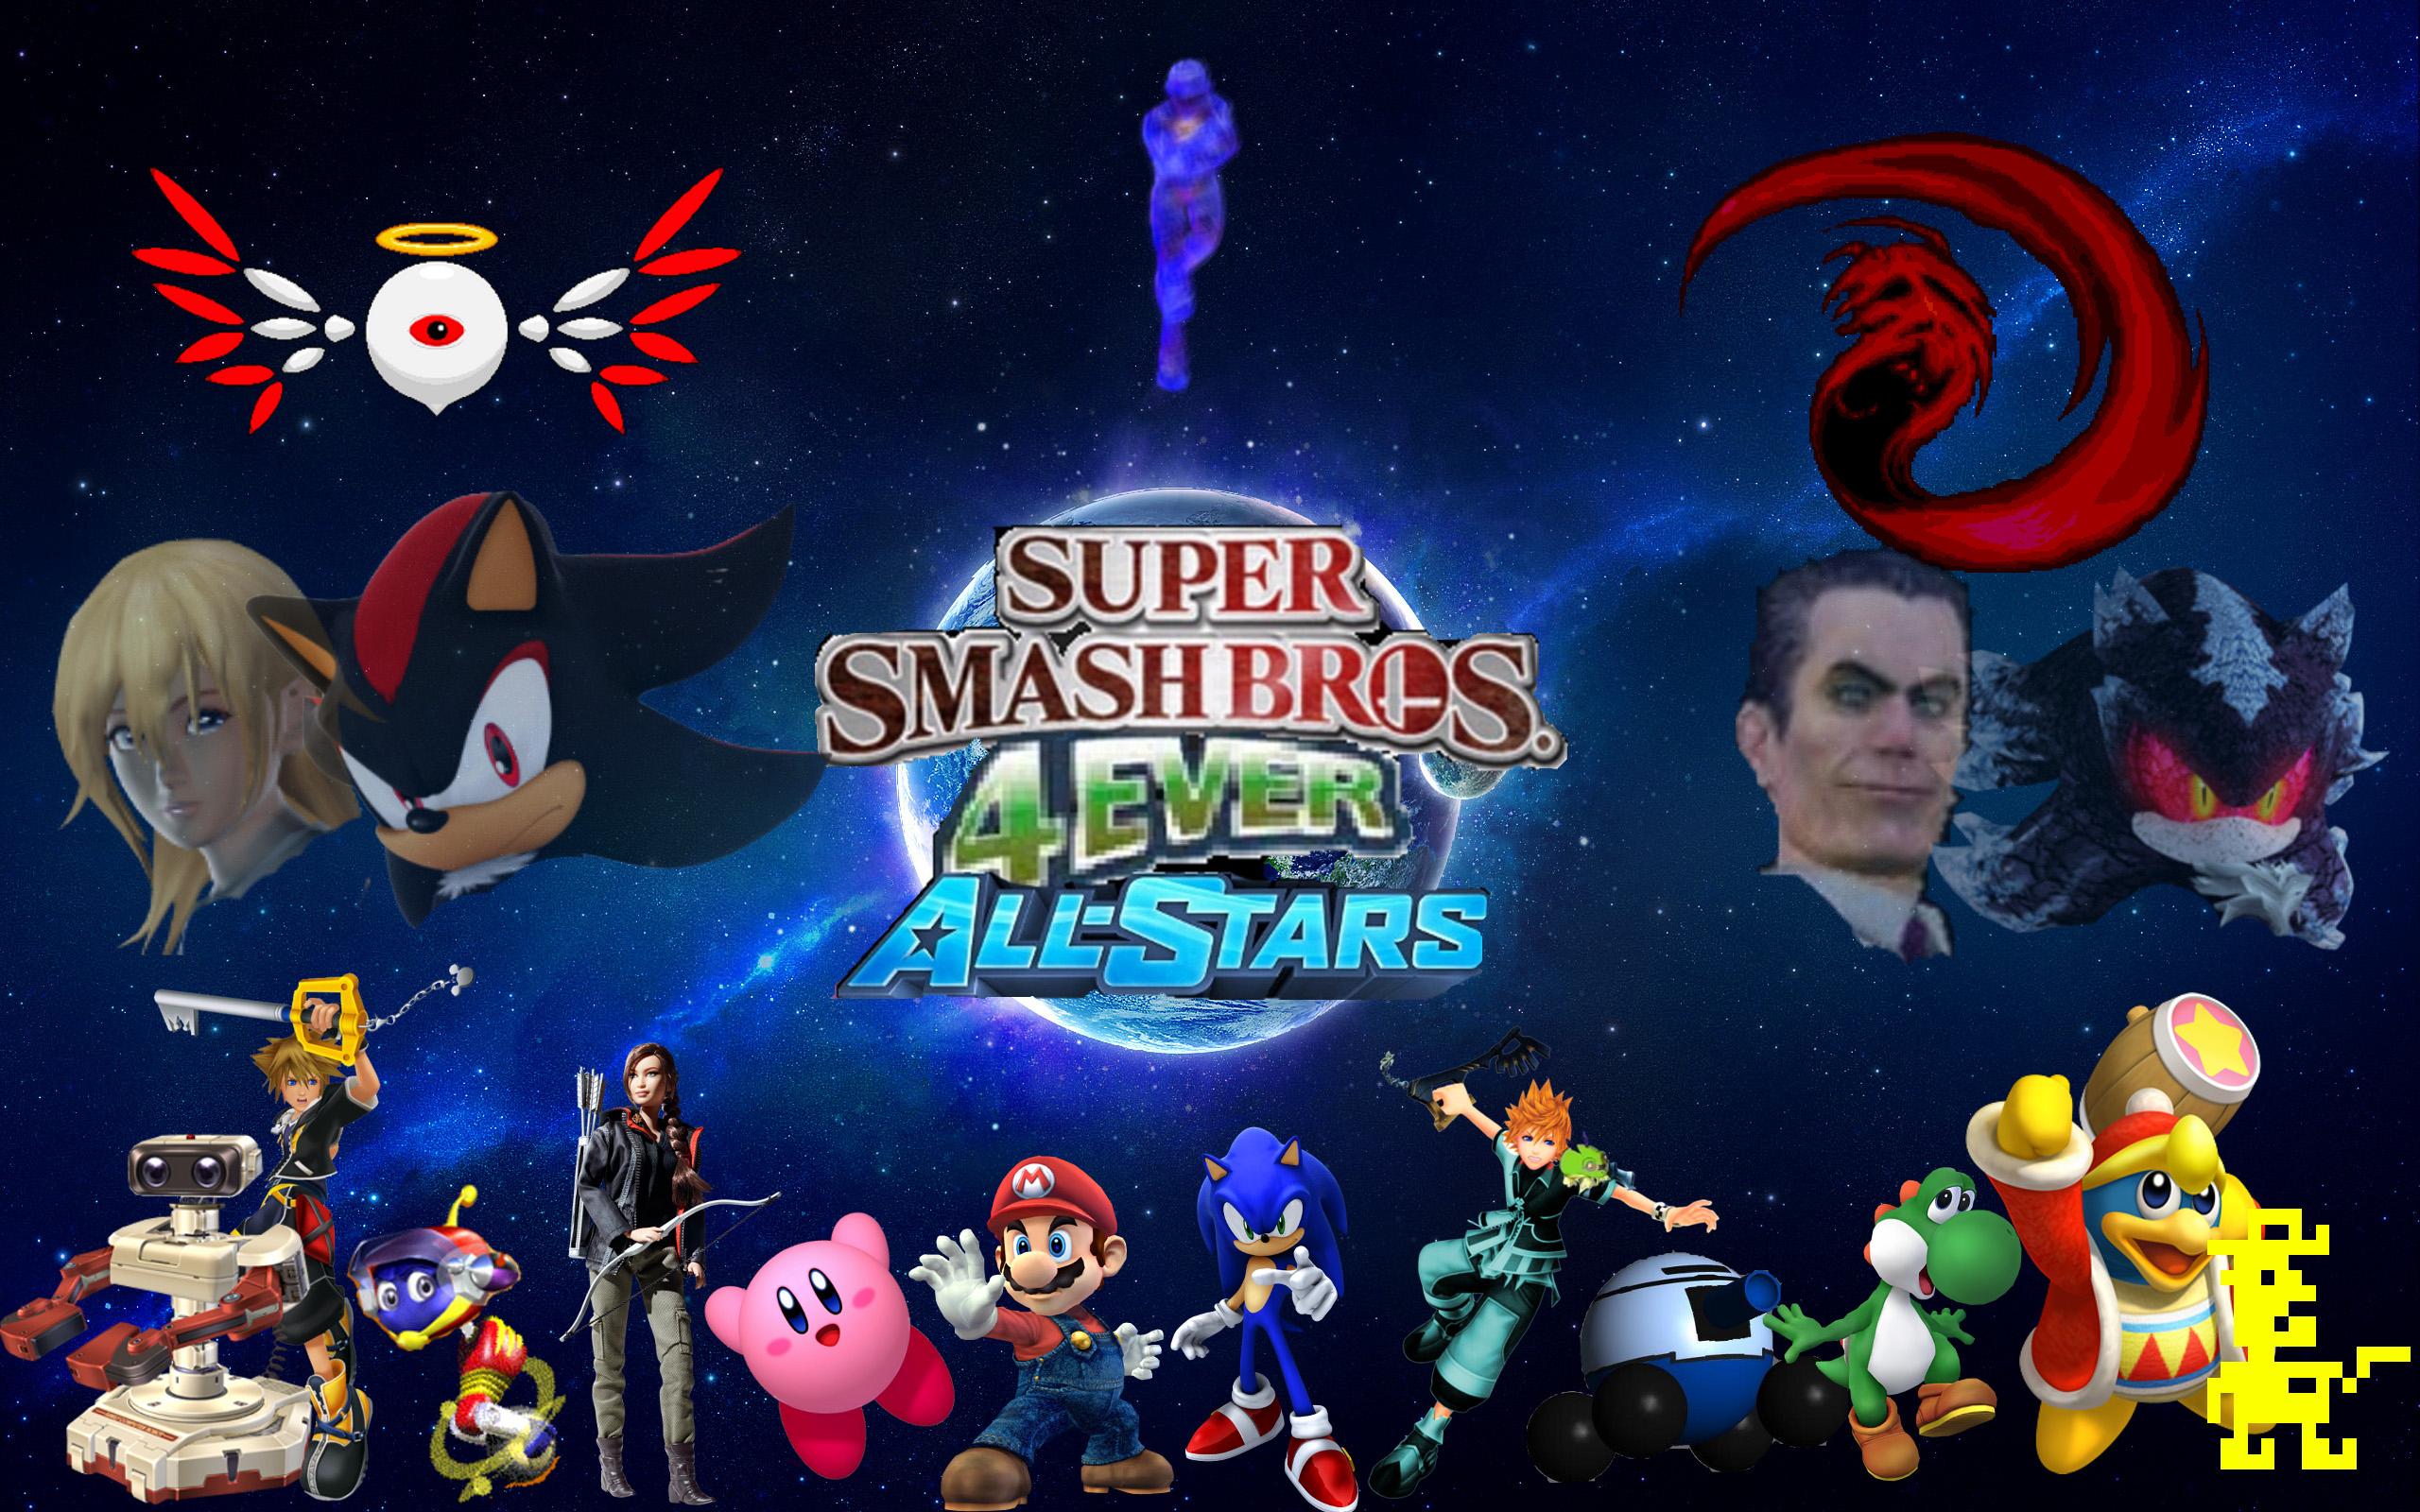 Super Smash Bros 4ever All Stars Wallpaper 2 By Roxasxiikeys On